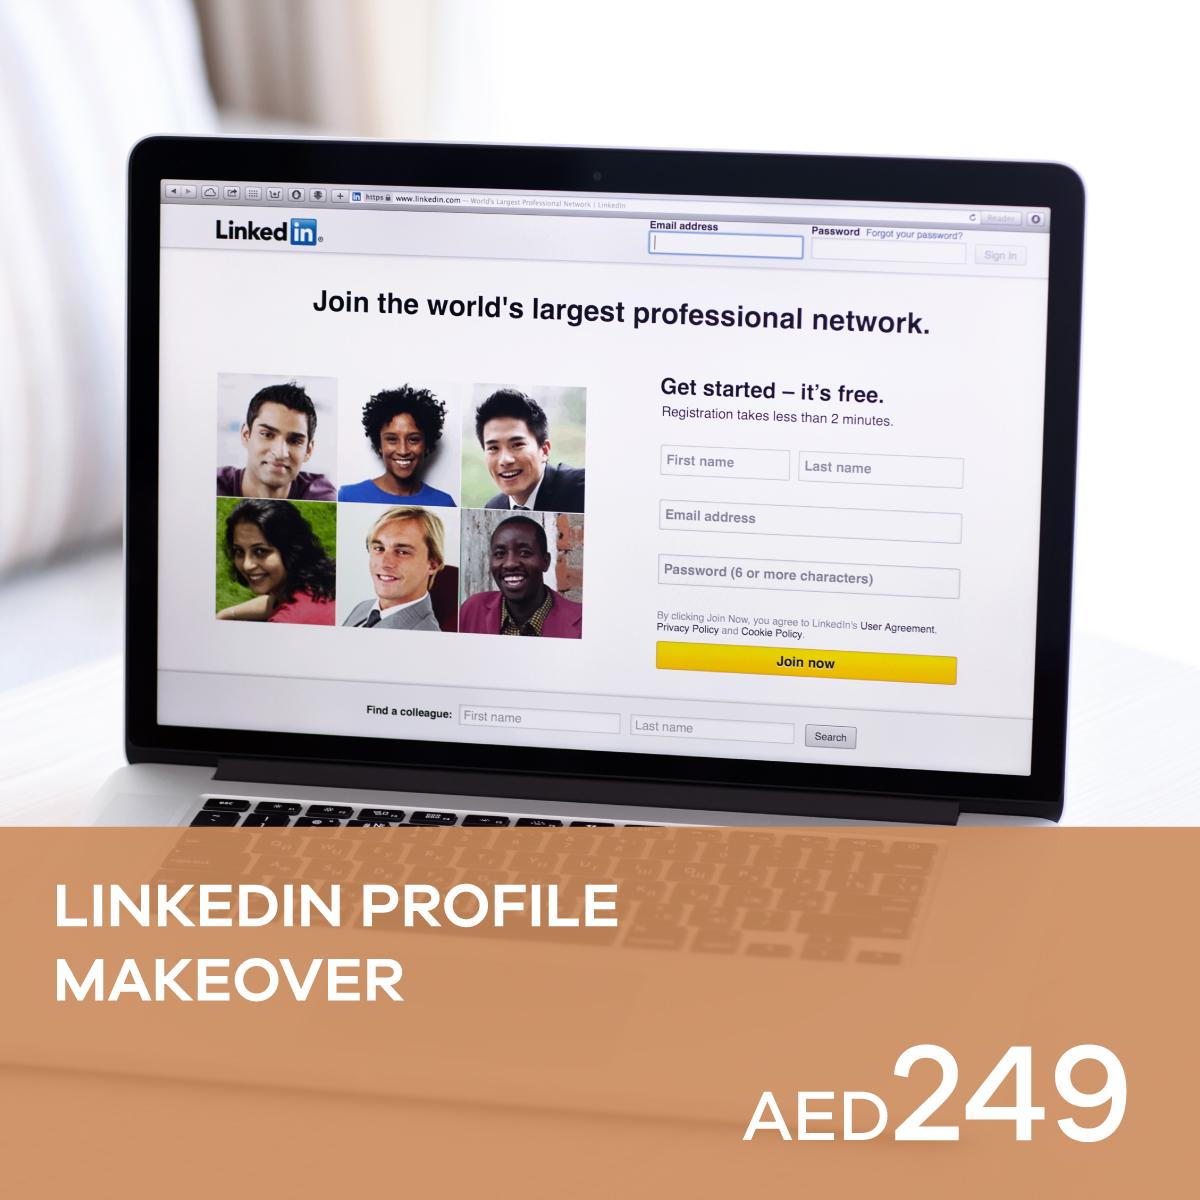 linkedin profile makeover  u2022 professional cv writing  u0026 resume writing services in dubai  uae